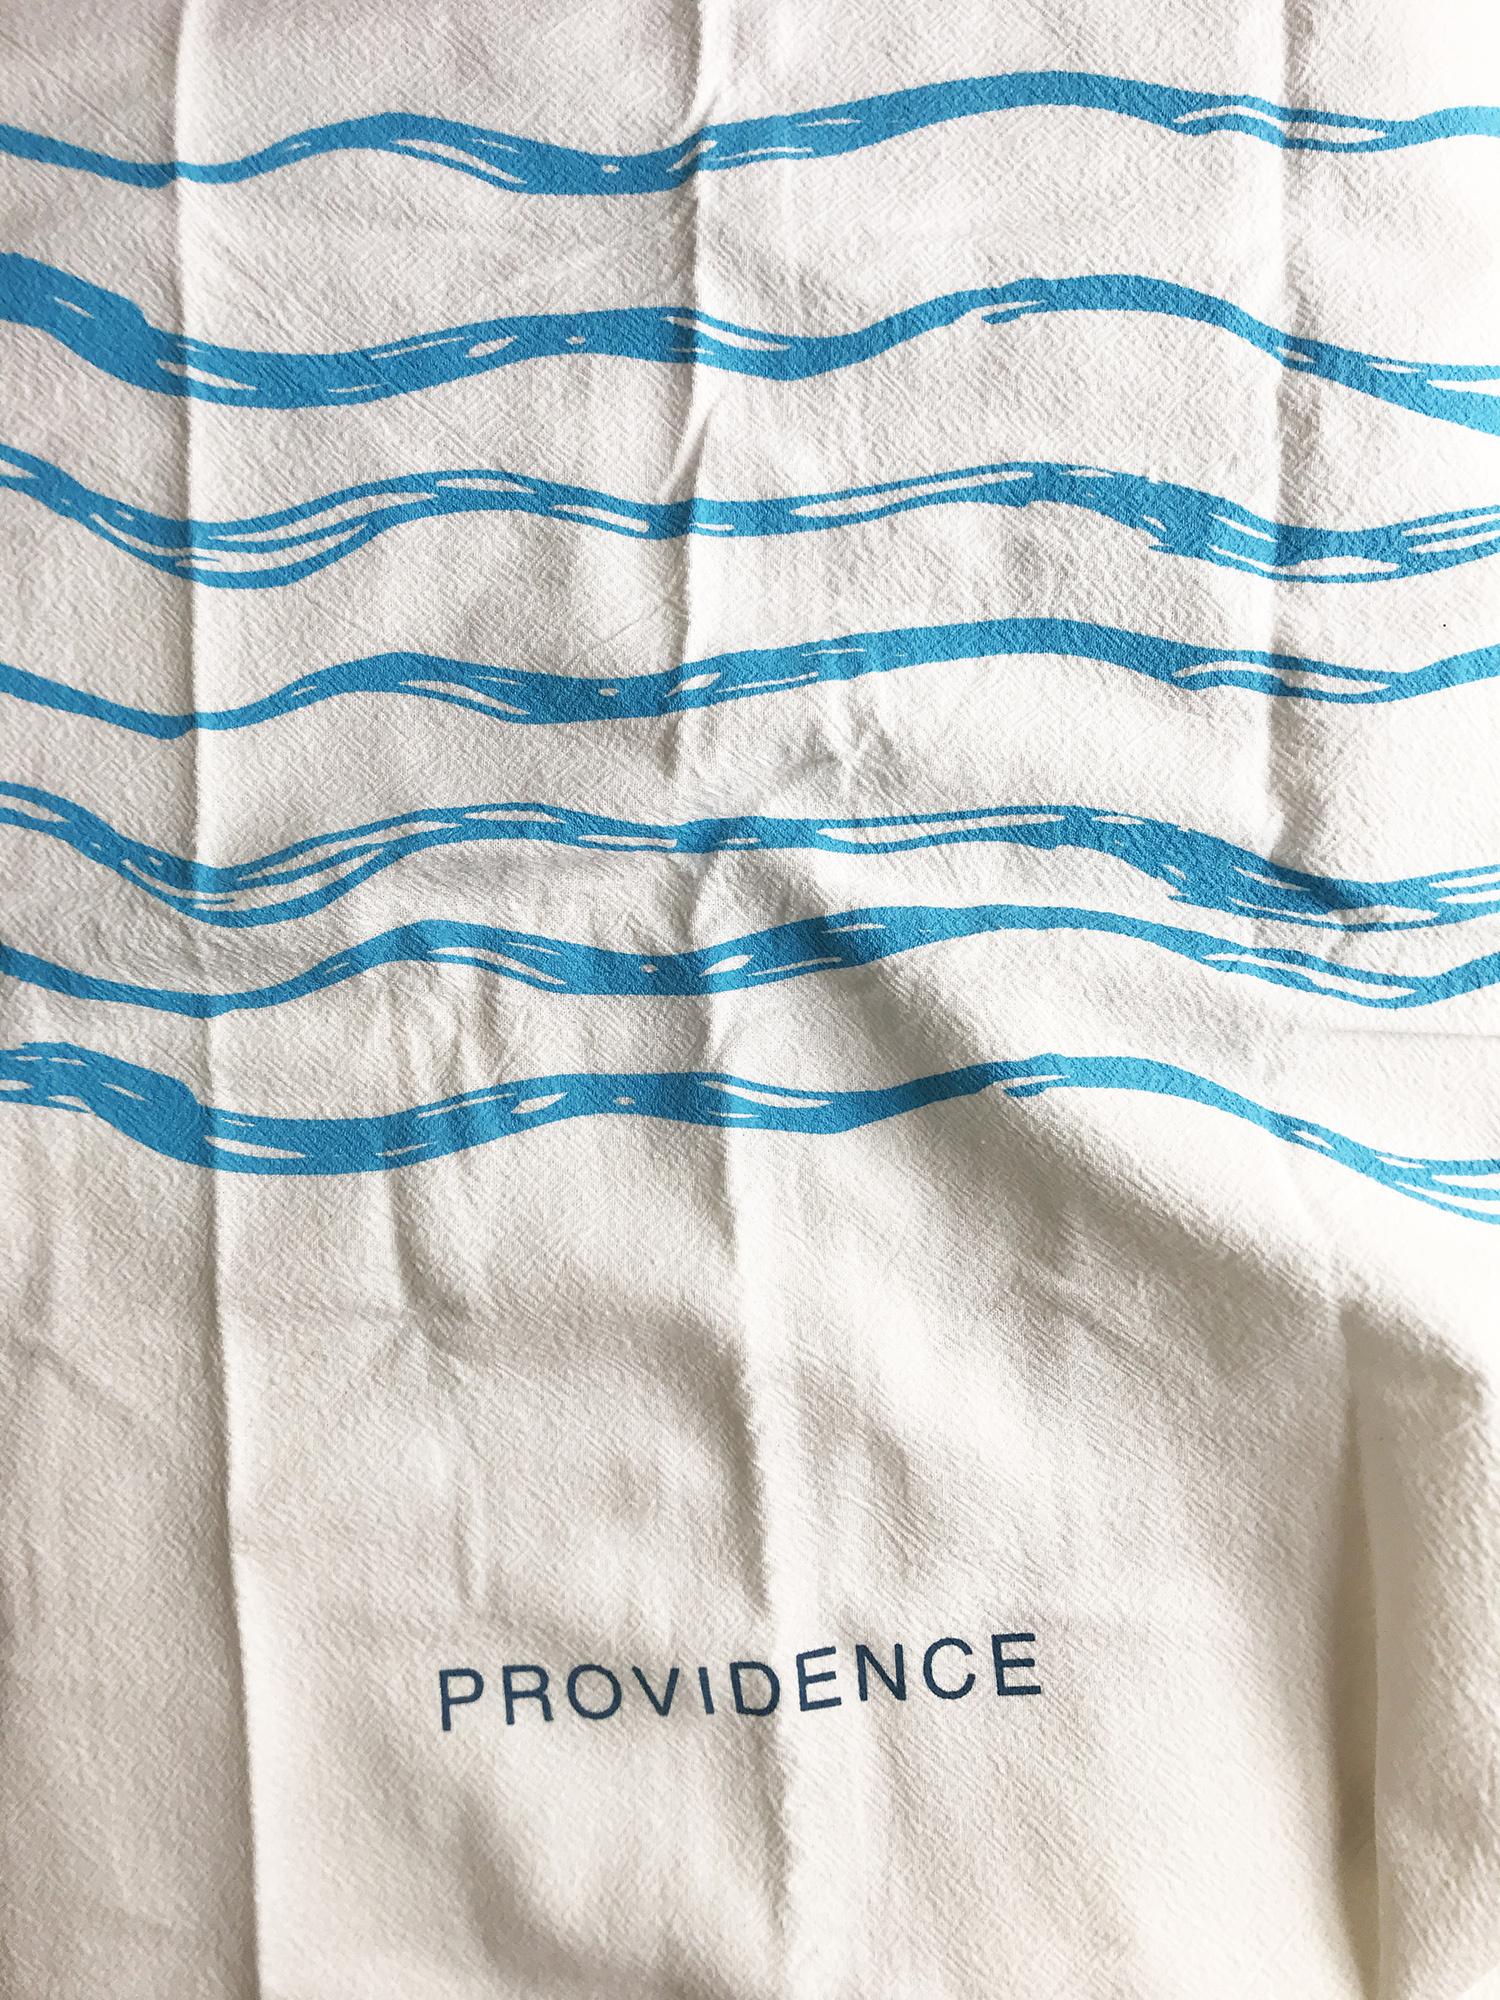 Stock Providence Rhode Island Made in RI Ocean State Flour Sack Tea Towels-2